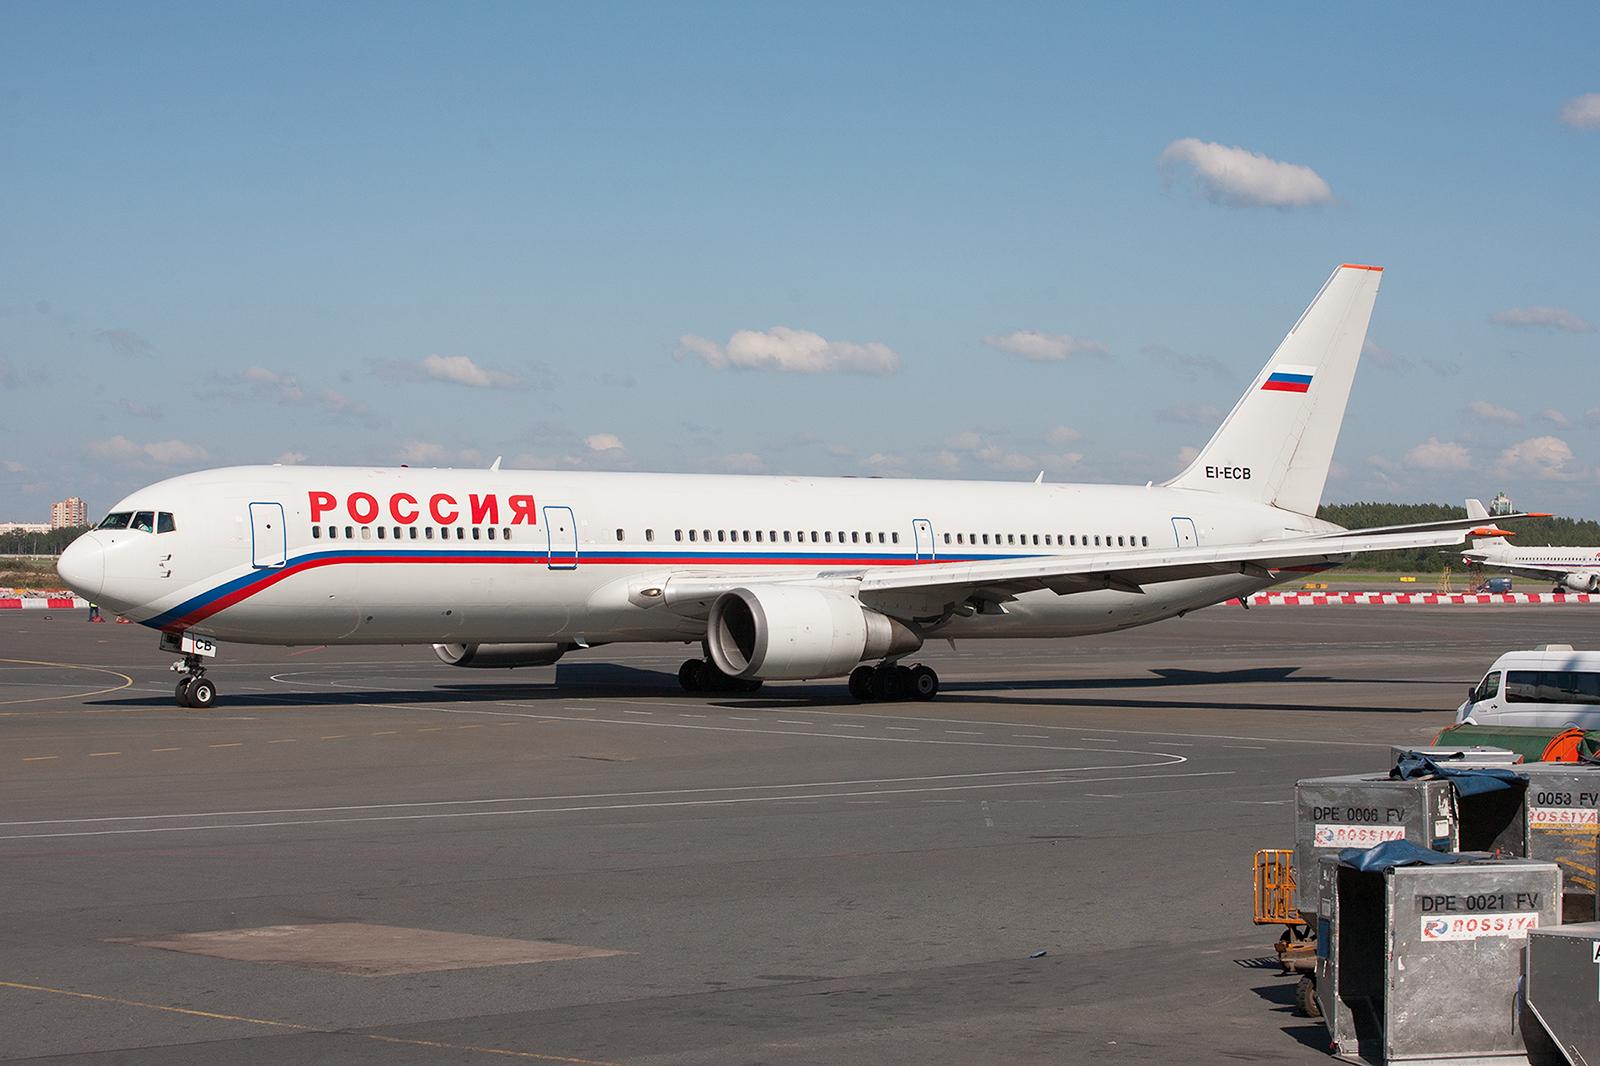 Rossiya mkit Großgerät, ex-Skymark Air und heute Royal Flight.